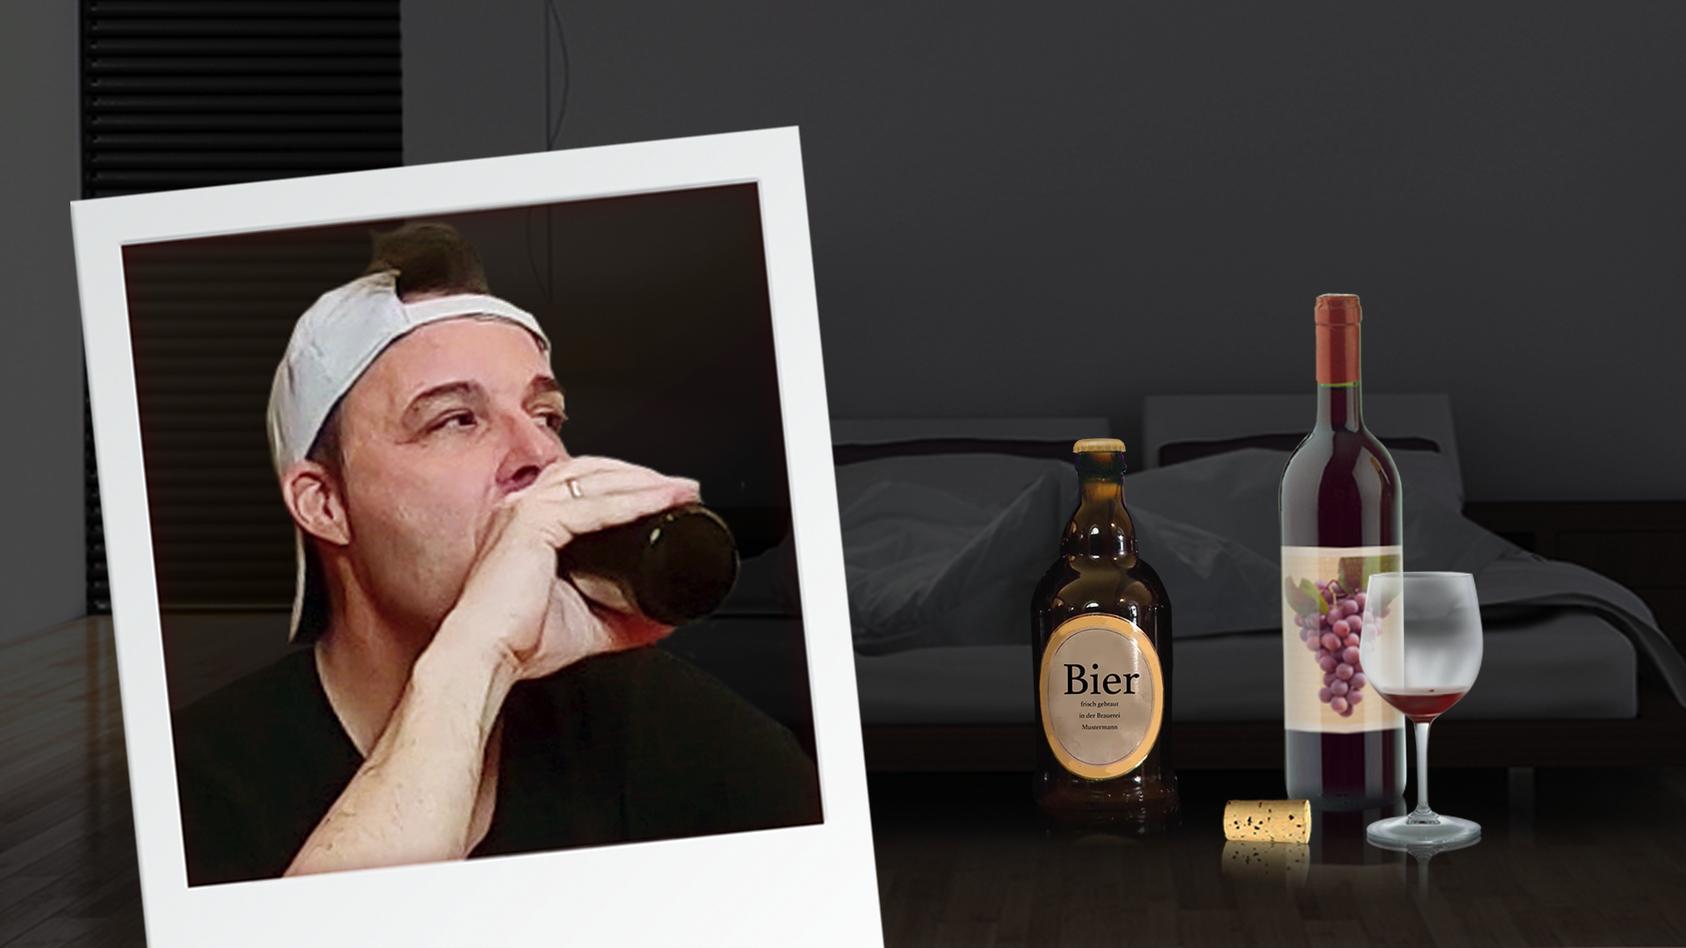 rtl-reporter-macht-den-test-mythos-besserer-schlaf-dank-alkohol